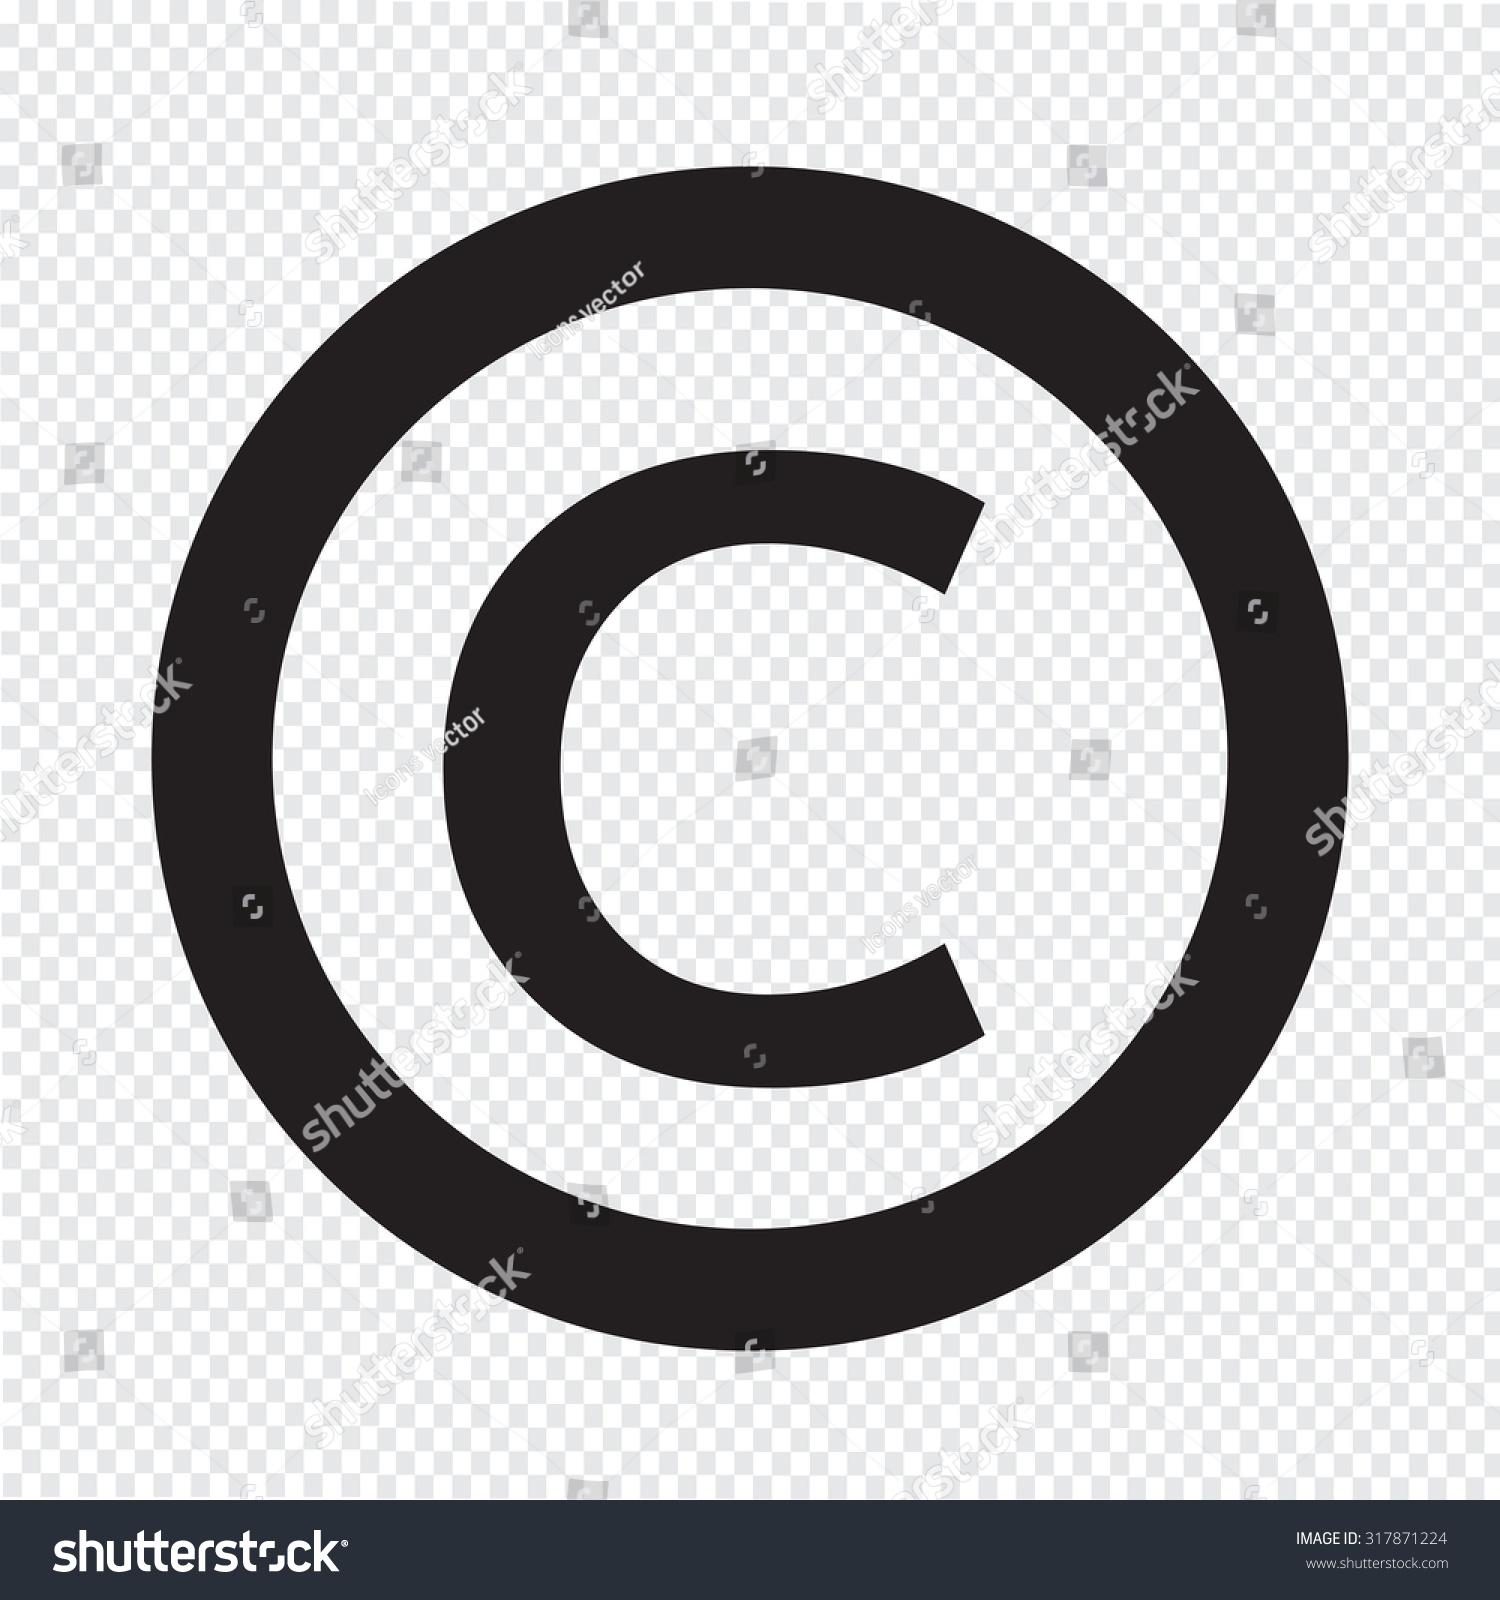 Copyright symbol icon stock vector 317871224 shutterstock copyright symbol icon biocorpaavc